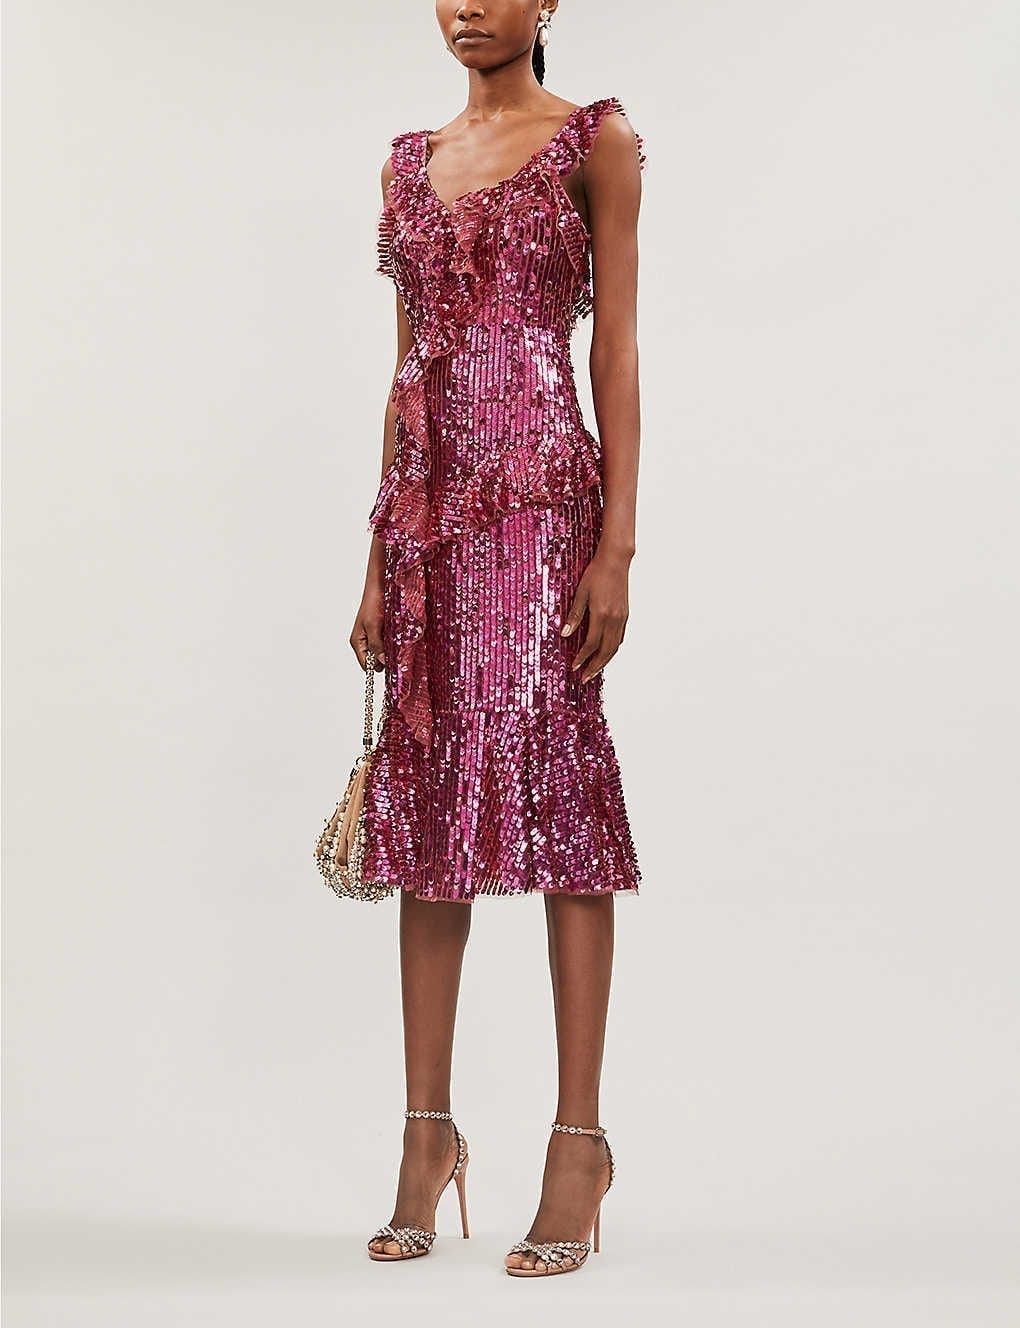 NEEDLE AND THREAD Scarlett Frilled V-neck Sequinned Midi Dress